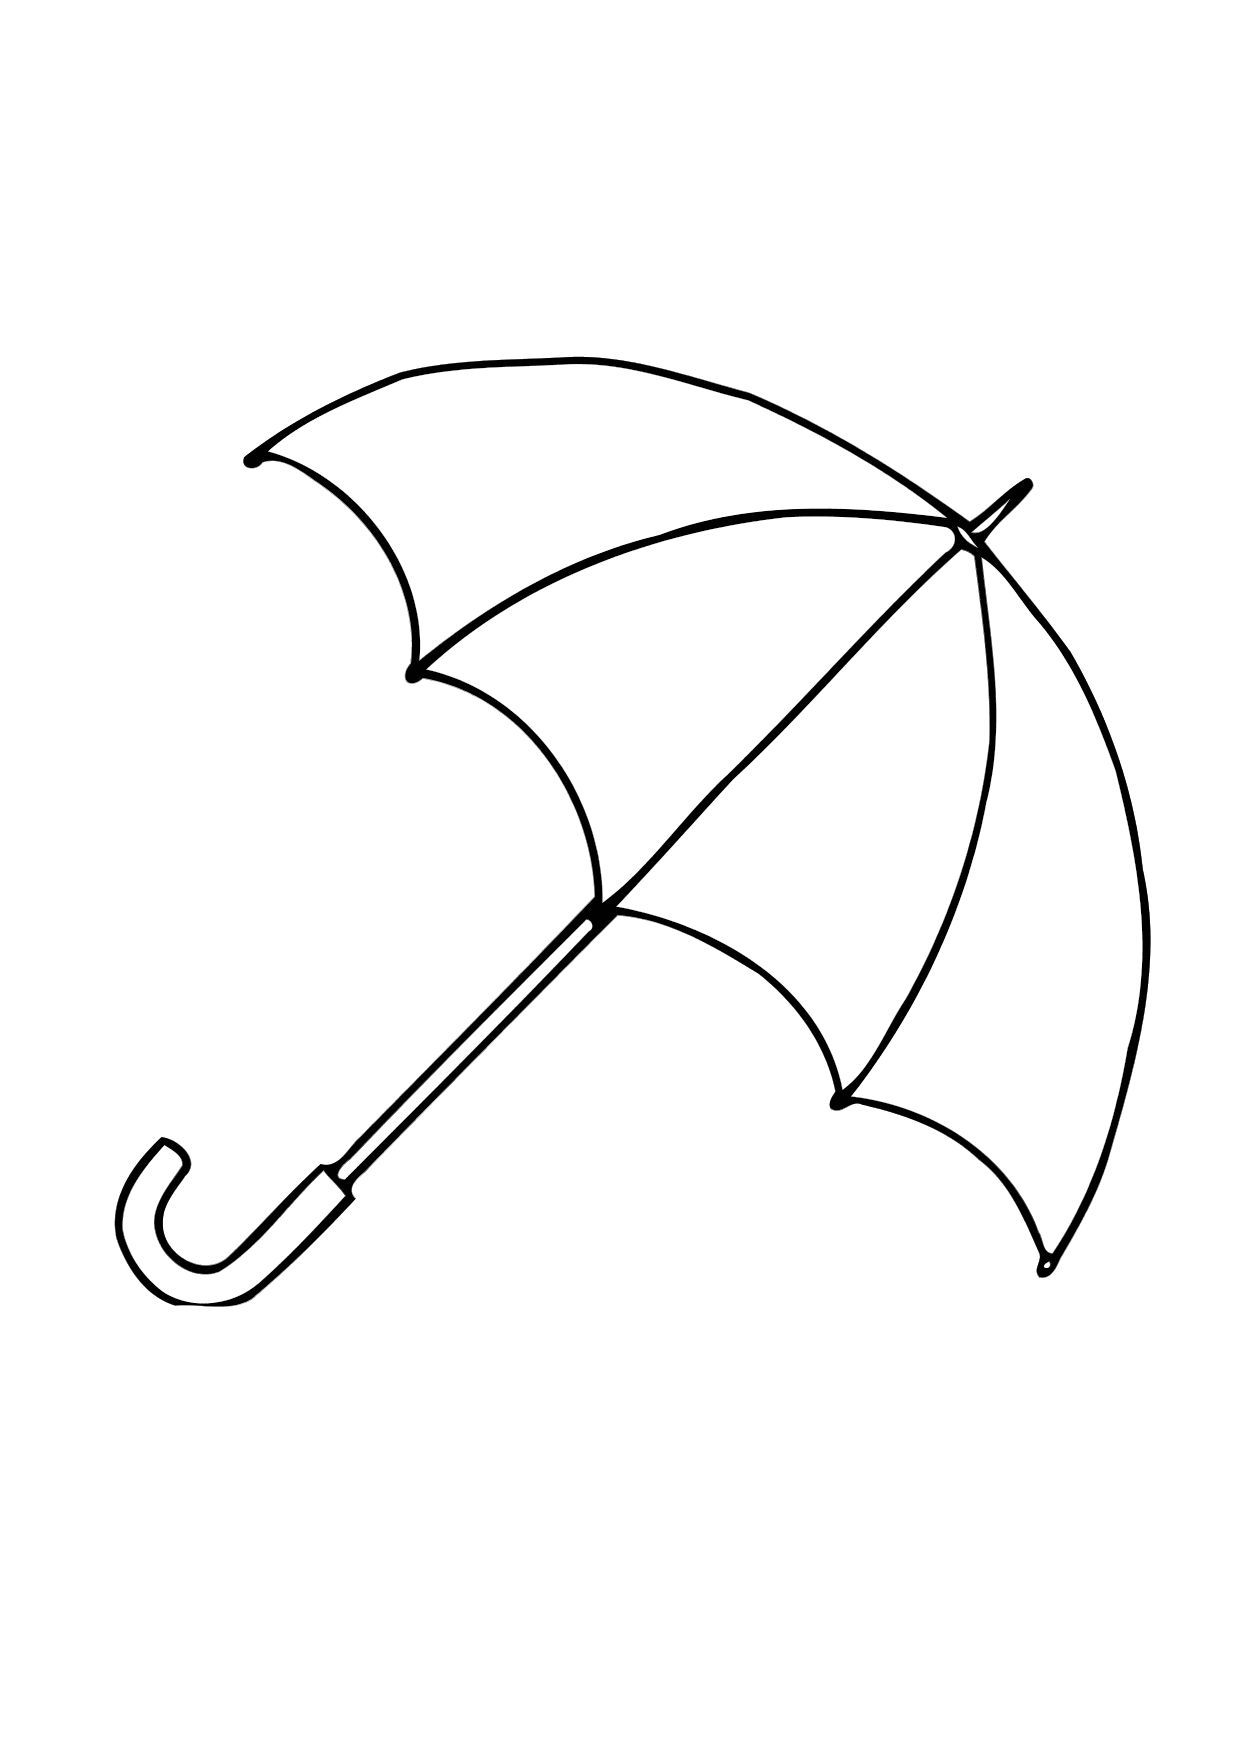 Simple Umbrella Shape